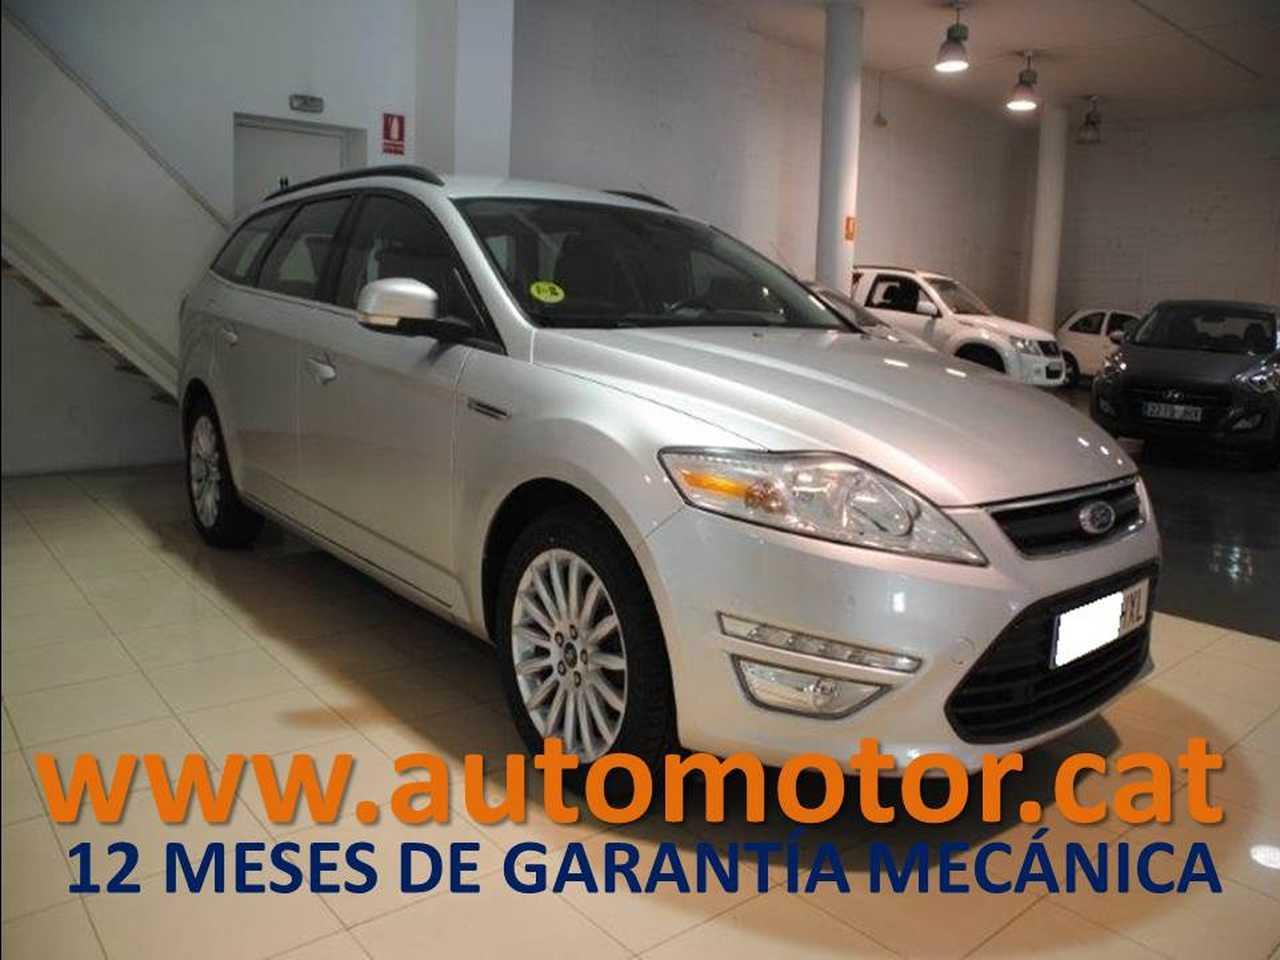 Ford Mondeo Familiar SB 1.6TDCi Limited Edition - GARANTIA MECANICA  - Foto 1